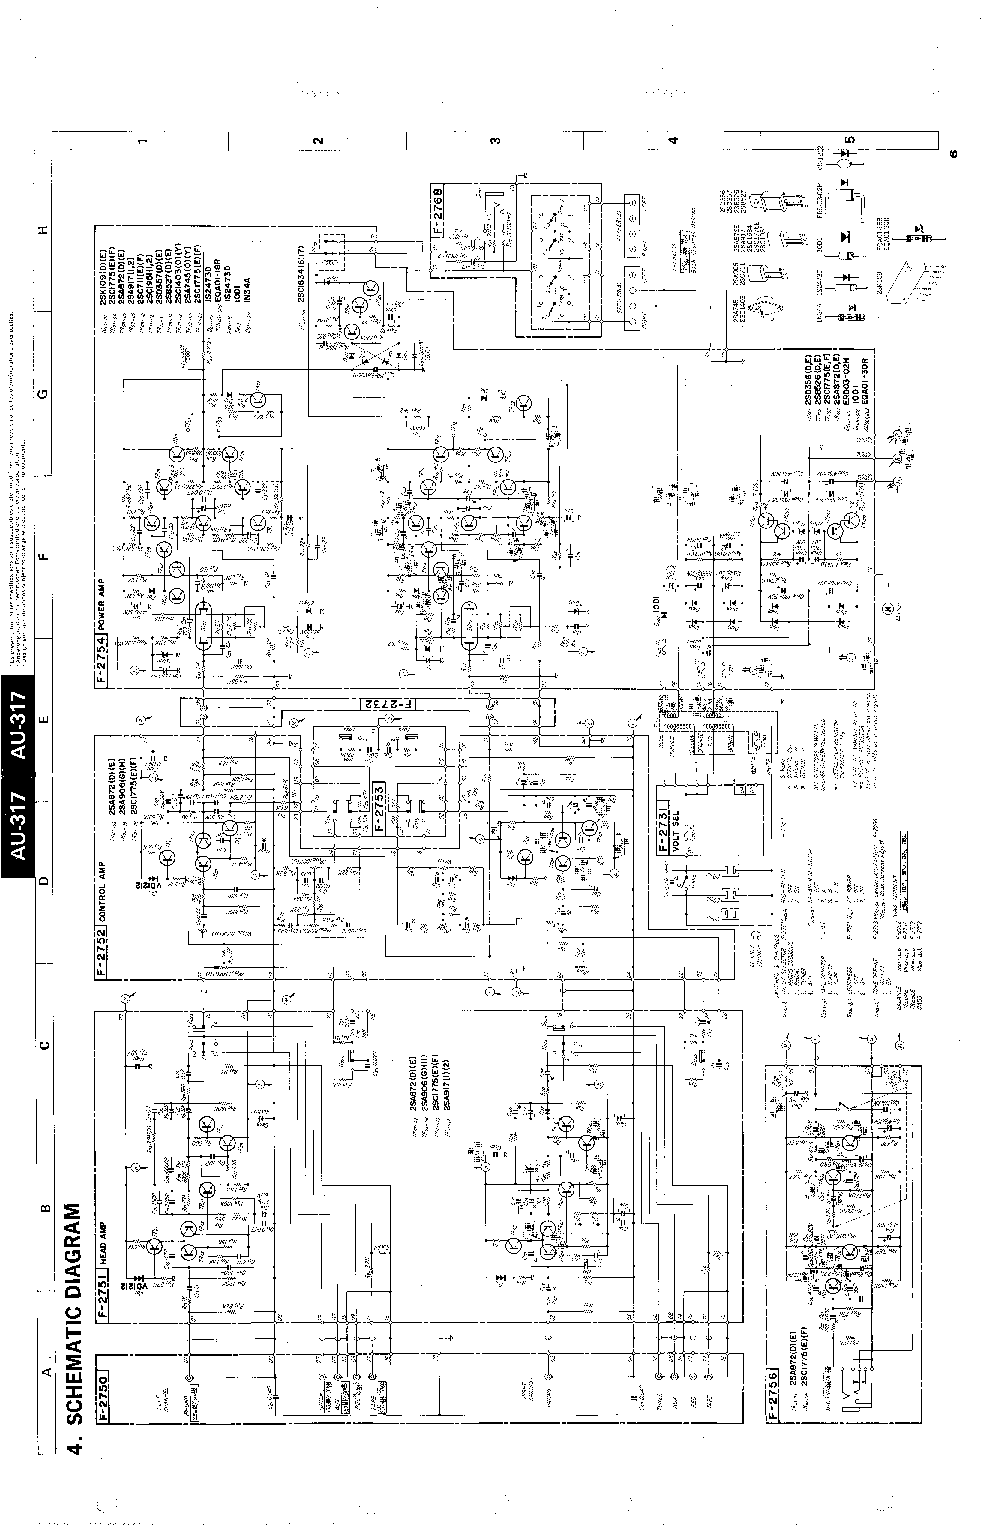 sansui au317 service manual download schematics eeprom repair rh elektrotanya com Sansui TU 217 Sansui TU 317